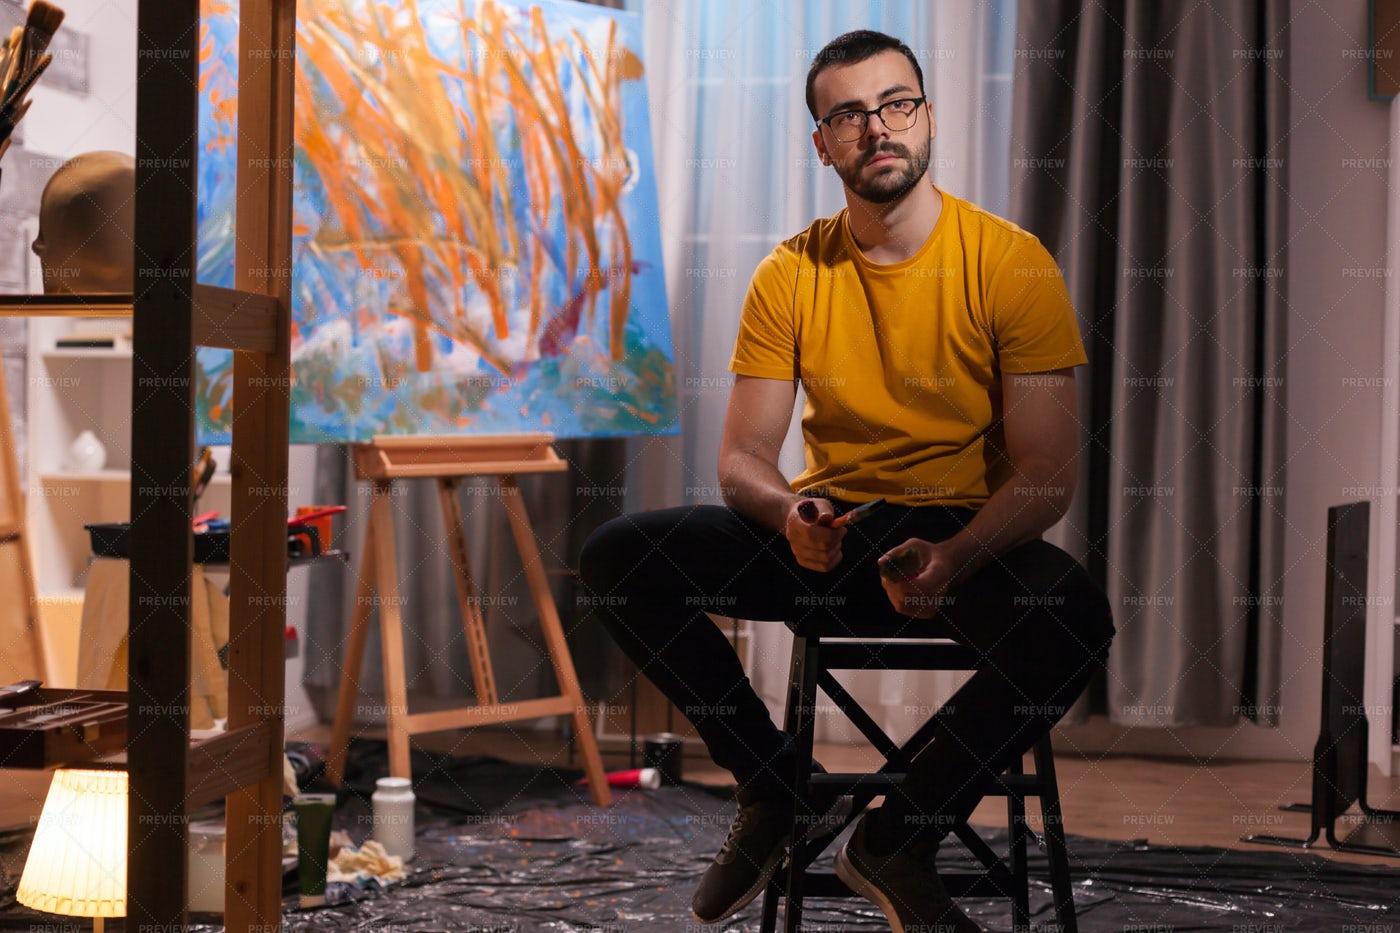 Artist In The Studio: Stock Photos